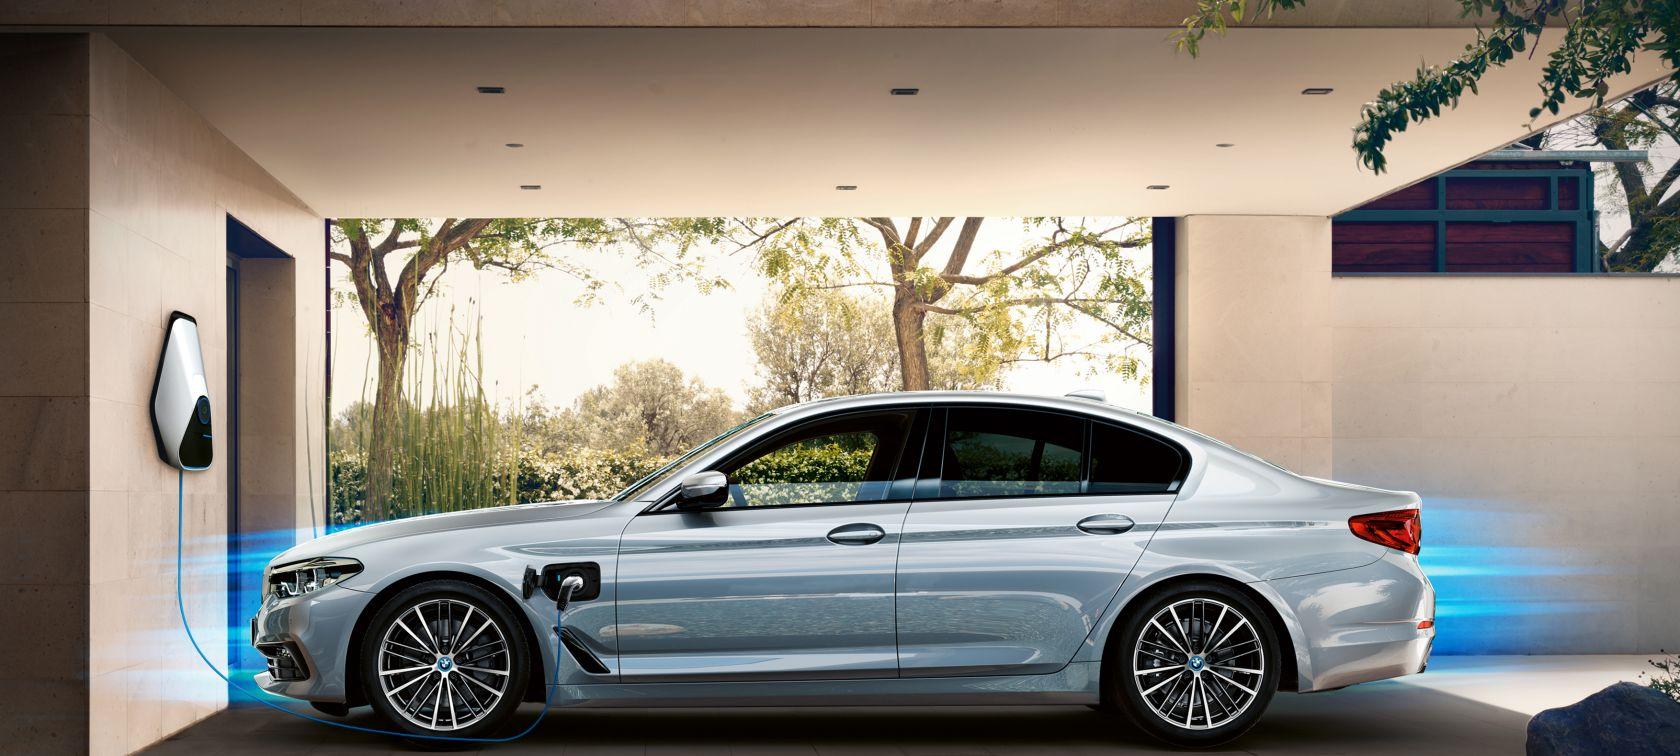 BMW 530e i 퍼포먼스 출시 BMW 5 시리즈 최초 PHEV 모델